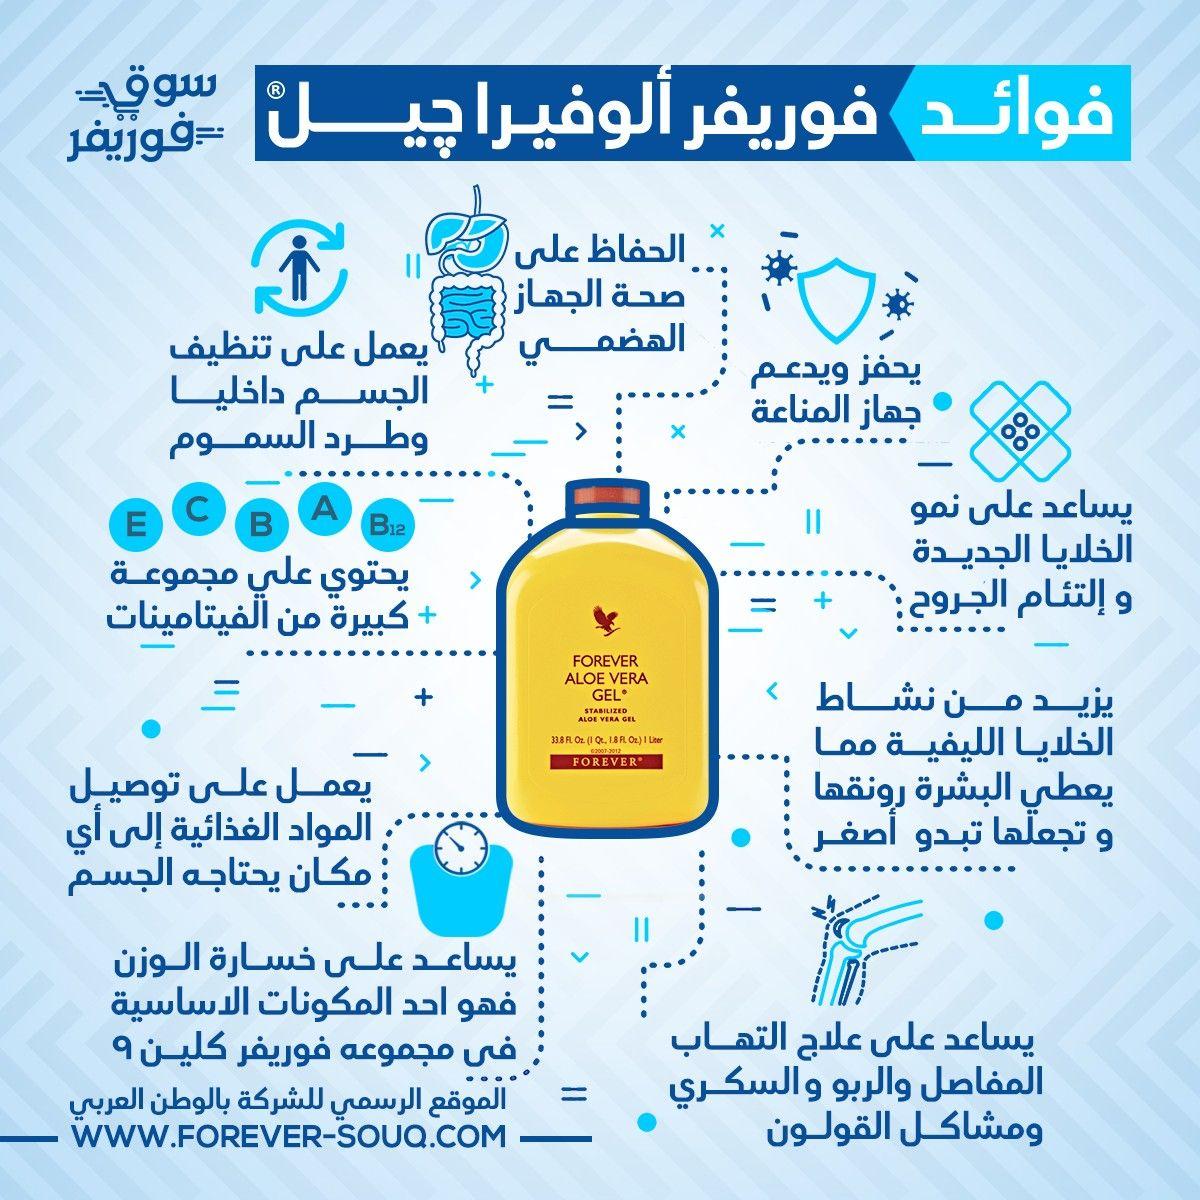 للتواصل عبر الواتس اب Https Api Whatsapp Com Send Phone 966541732541 او عن طريق الموق Aloe Vera Health Benefits Aloe Vera Gelly Forever Living Products